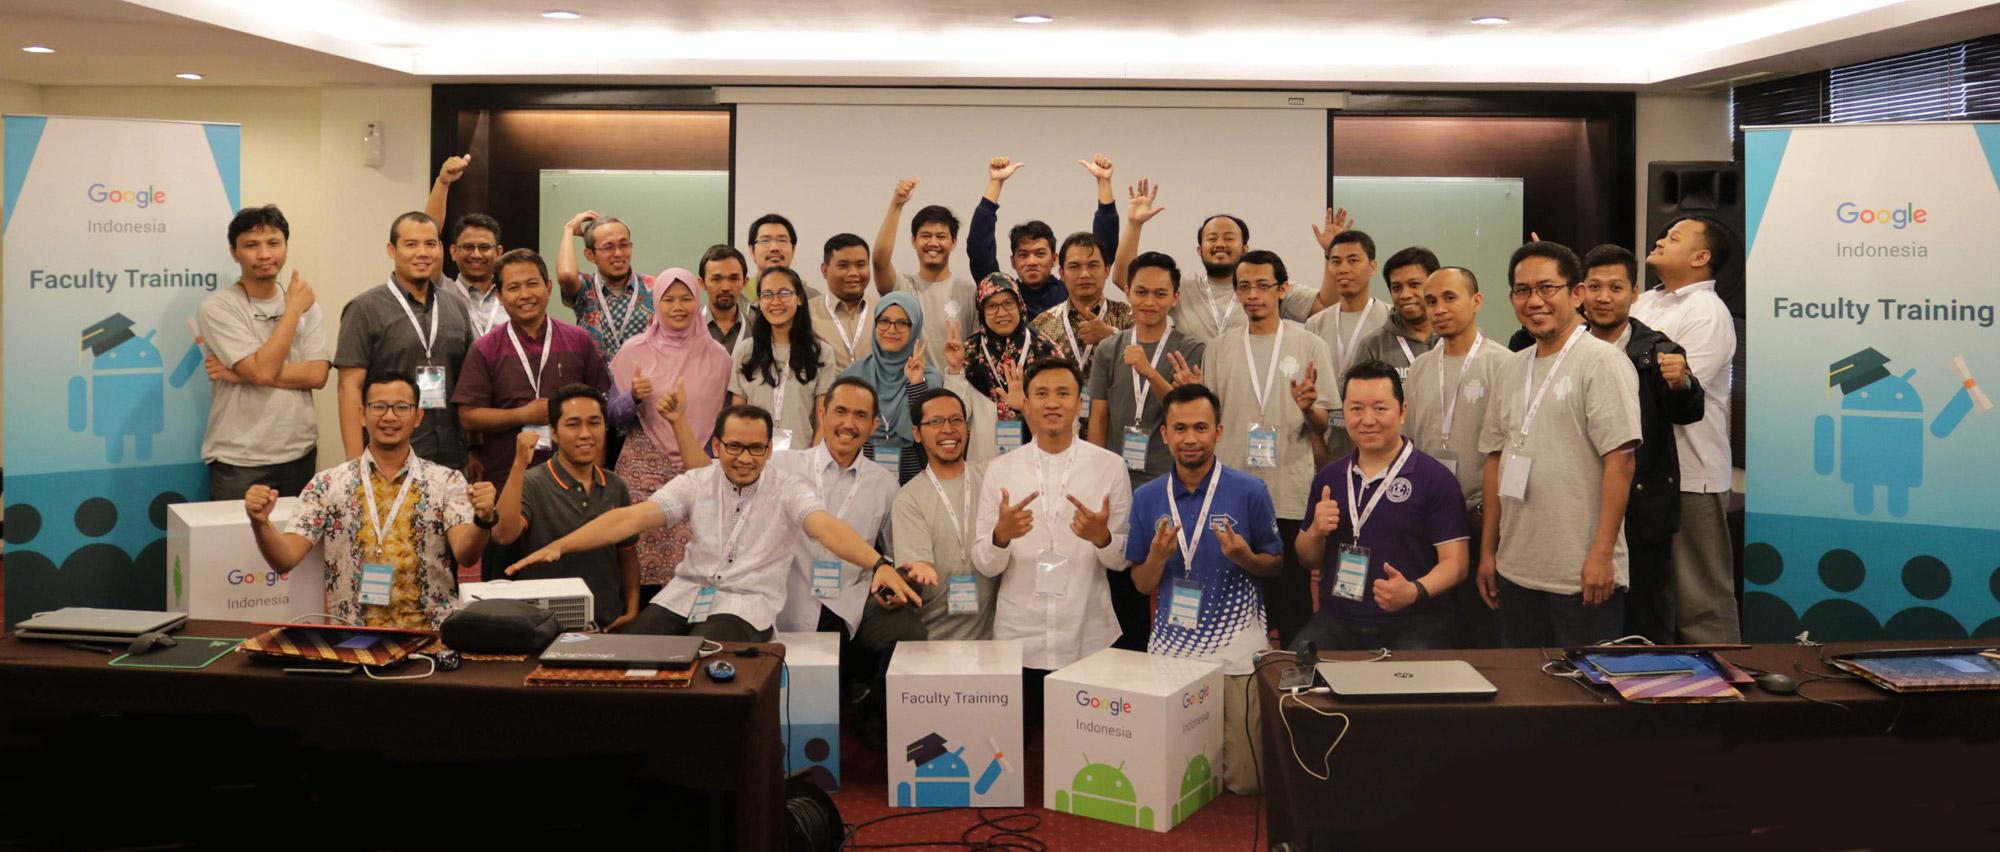 Group Photo para dosen peserta Beasiswa Google Faculty Training Batch 3 di Bandung 24-28 September 2018 di sesi terakhir sebelum berpisah dan kembali ke kota masing-masing